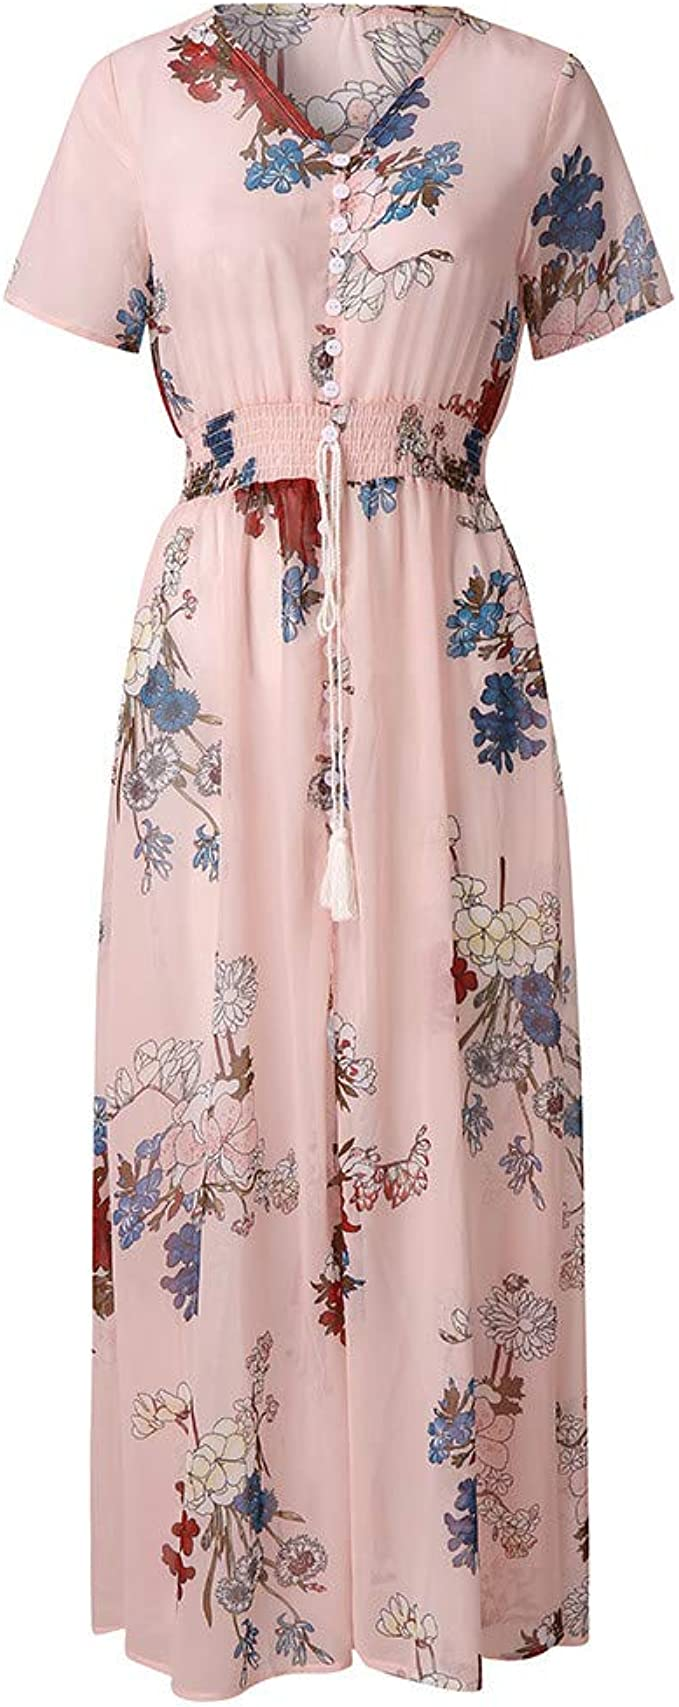 Cramberdy Damen Kleid Vintage Langarm Mittelalter Kleid Gothic